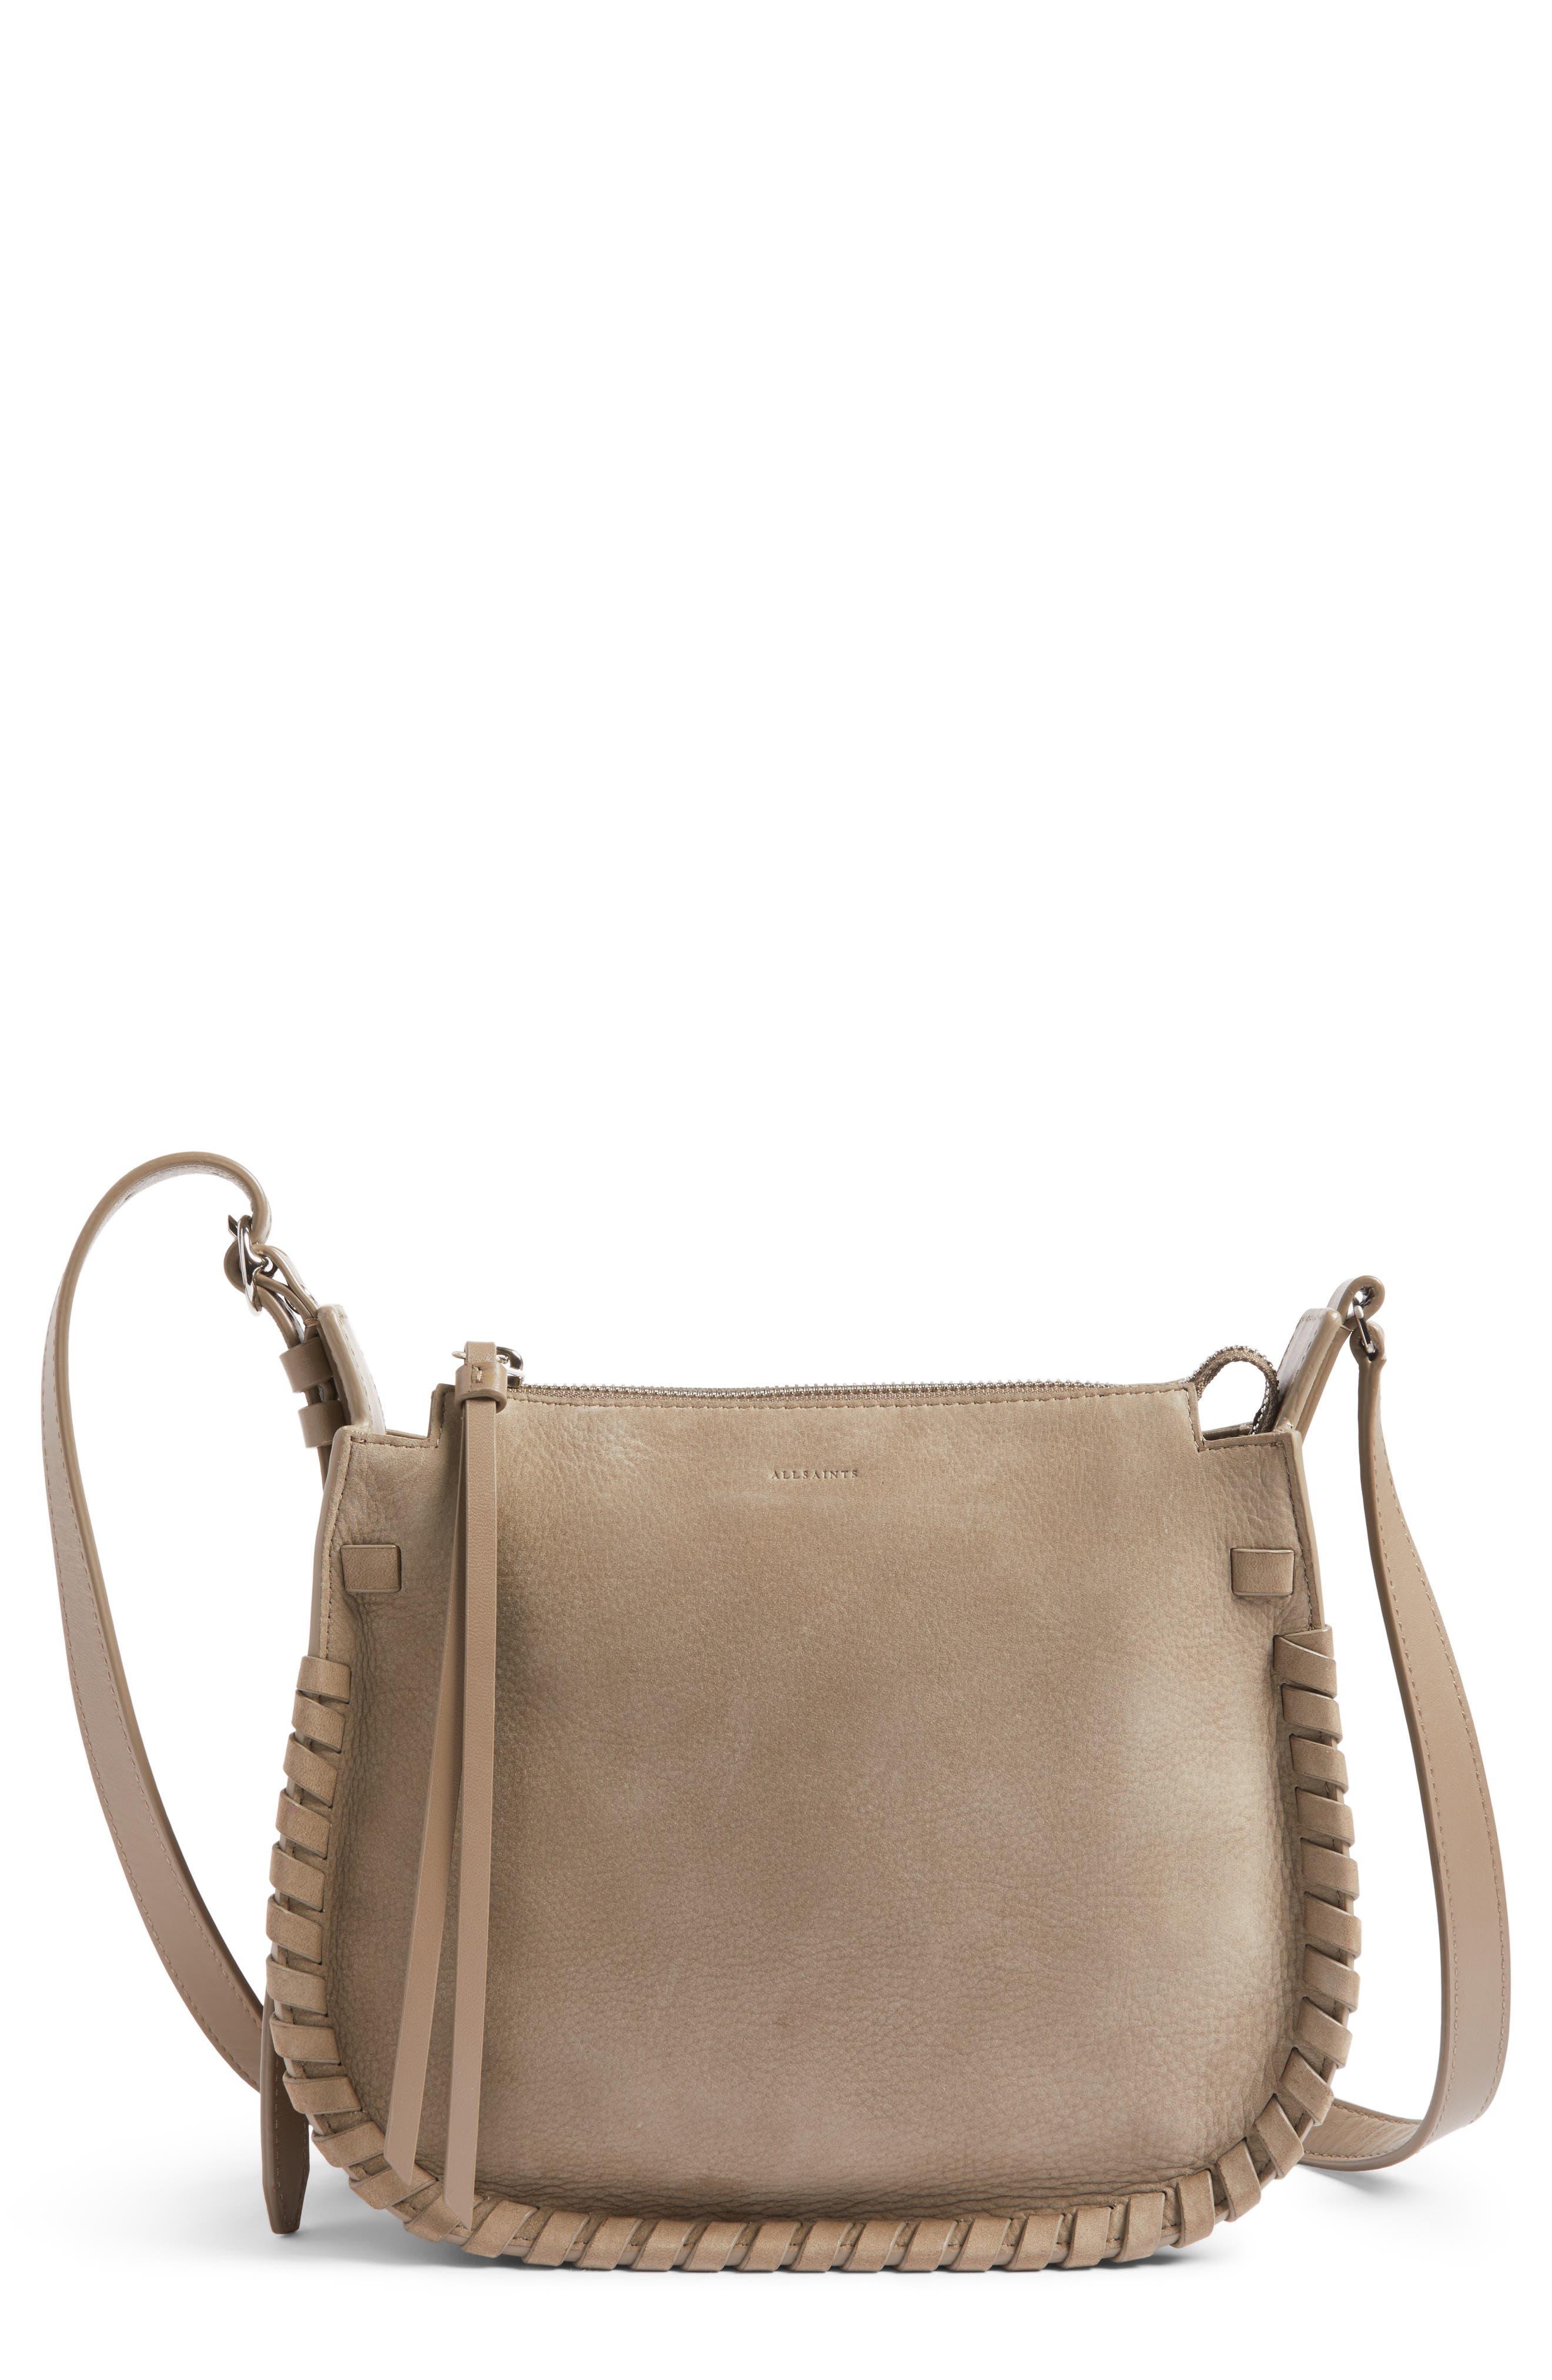 ALLSAINTS Ray Nubuck Crossbody Bag, Main, color, 080